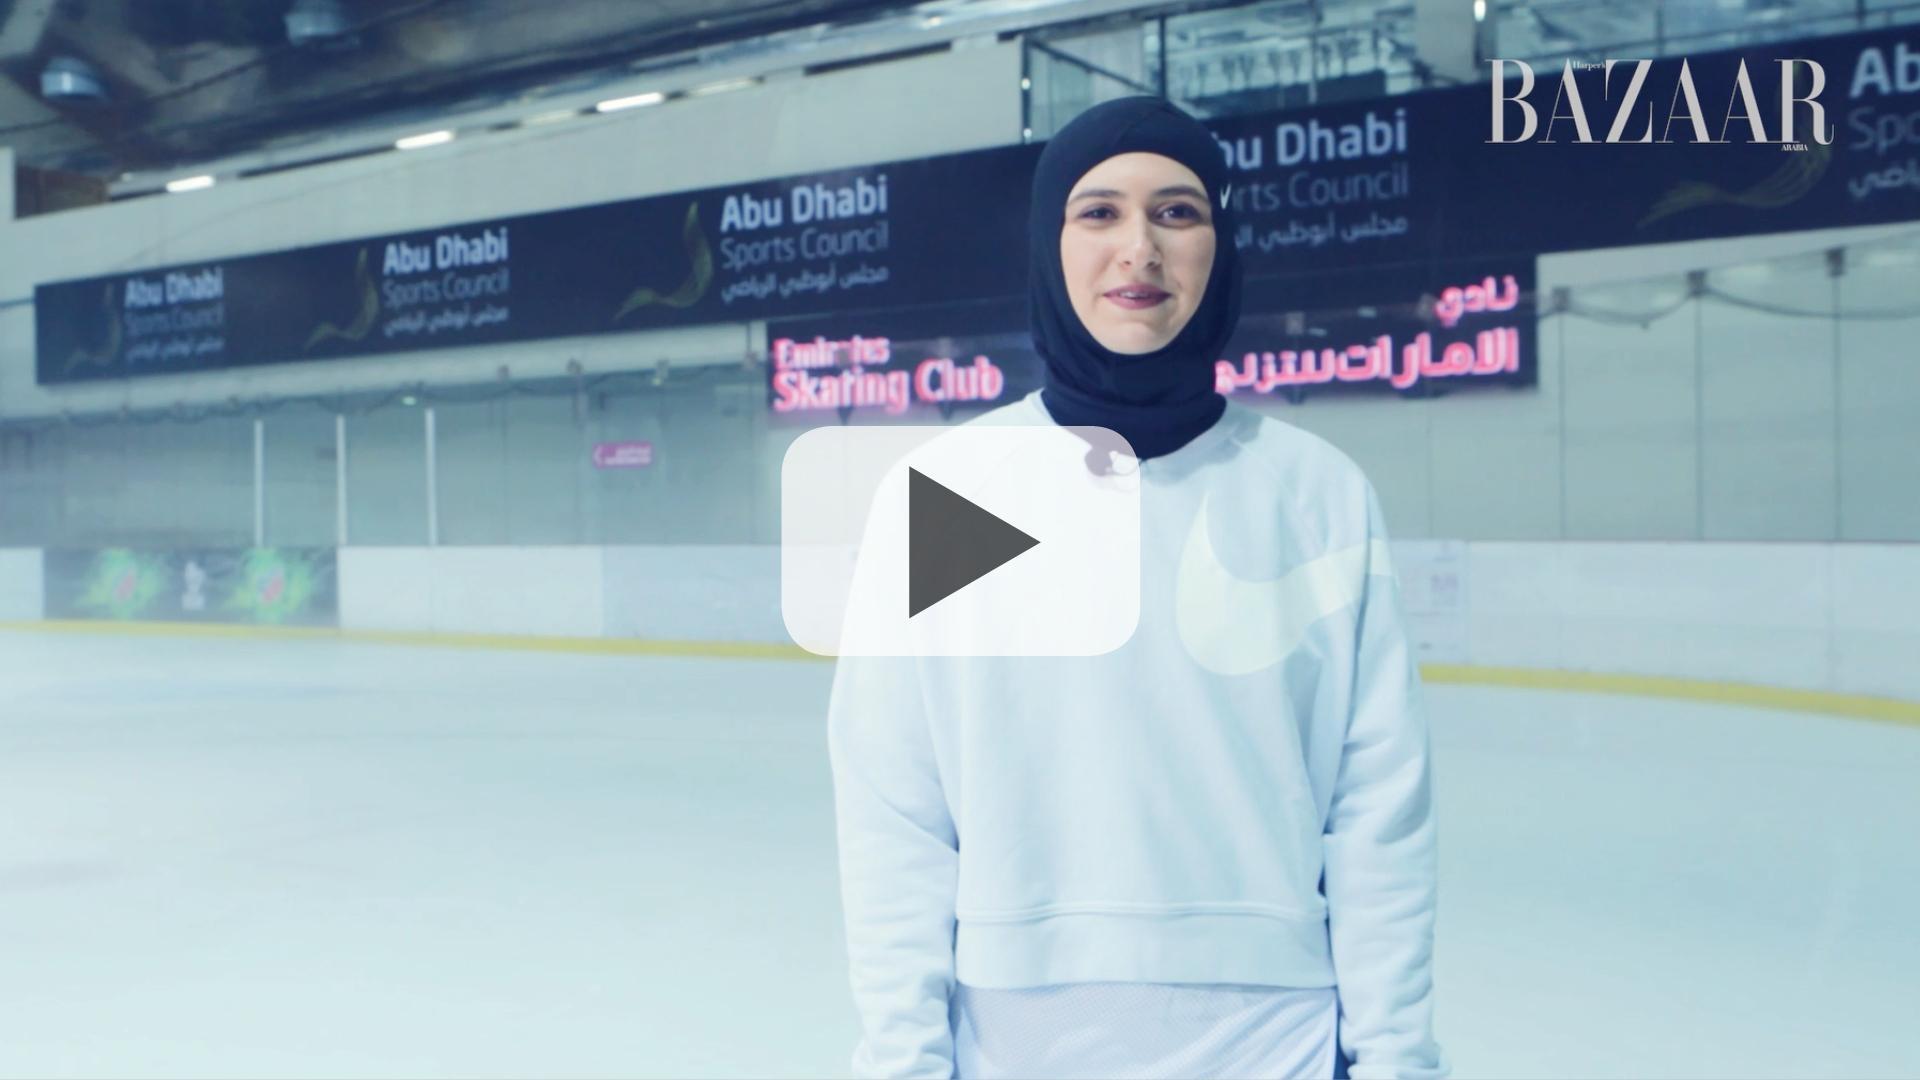 Watch Now: Meet Zahra Lari, The UAE's First Female Figure Skater